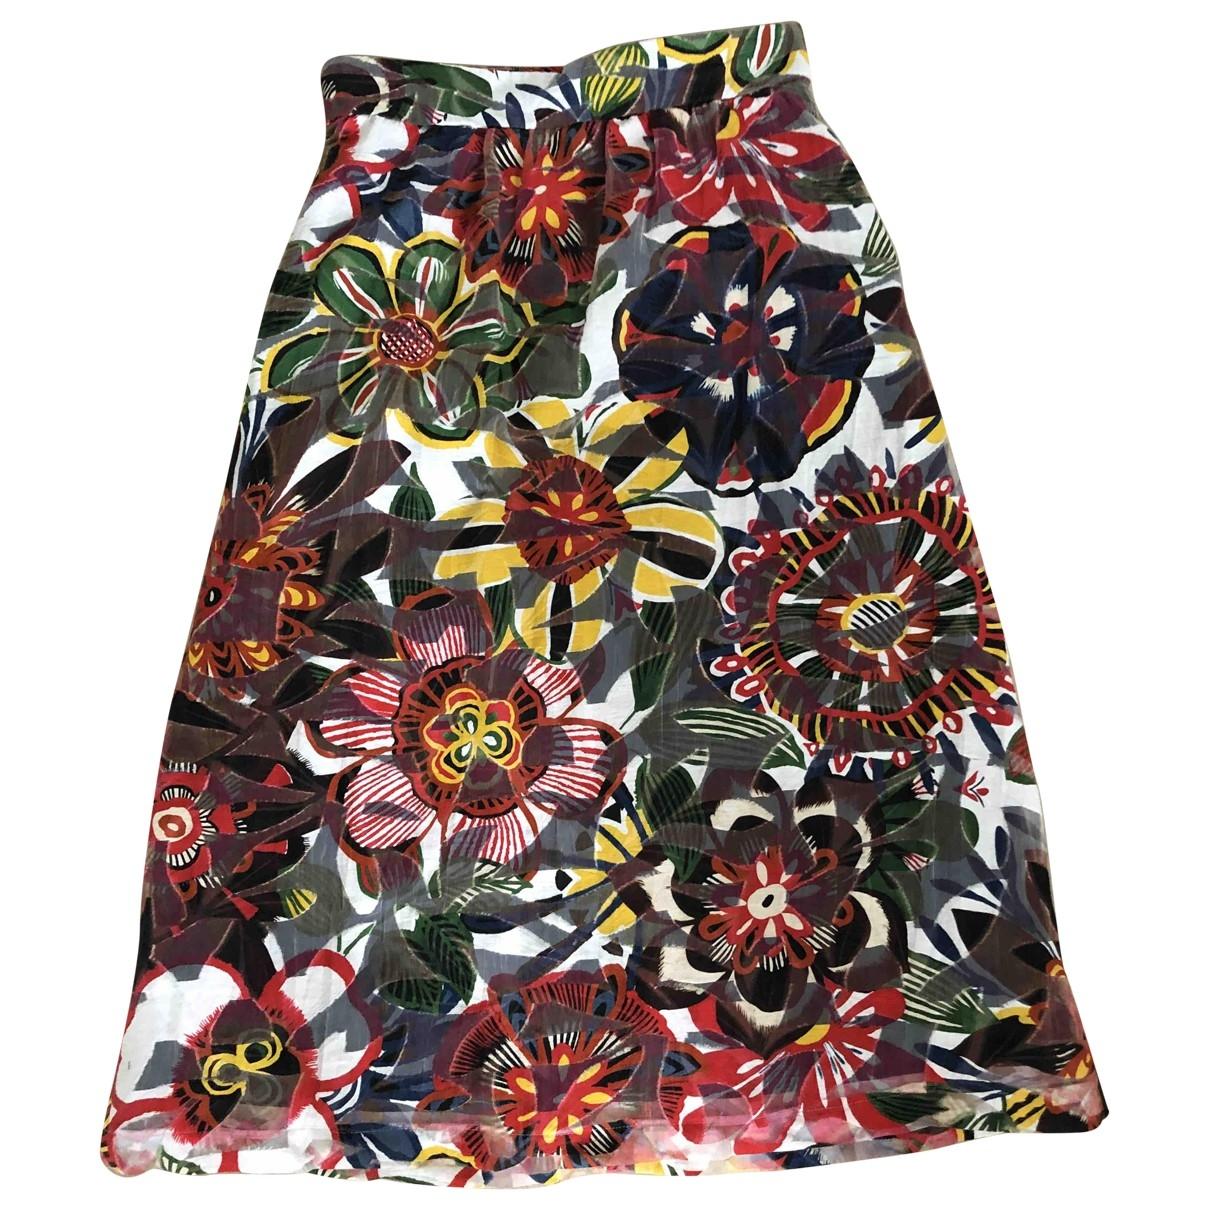 Max & Co \N Multicolour Cotton skirt for Women 42 IT